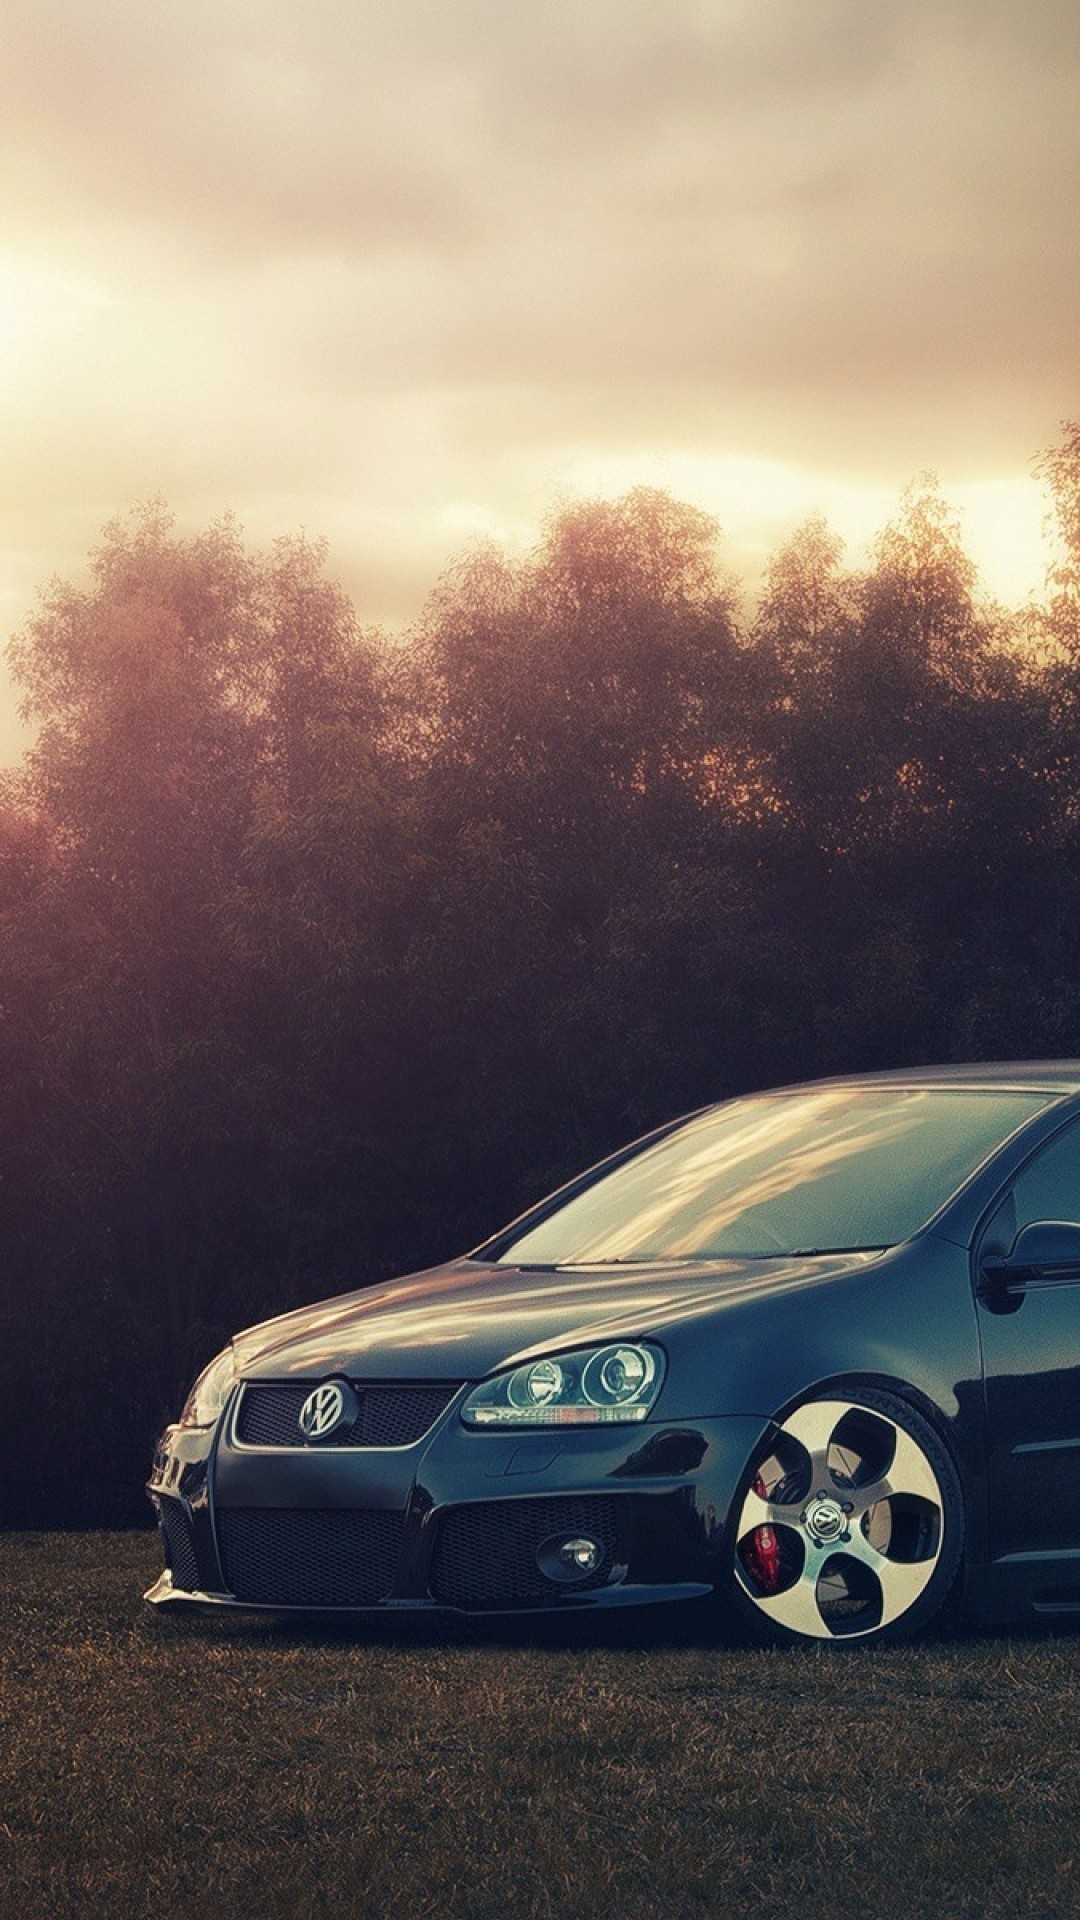 Golf Car hd wallpaper for mobile